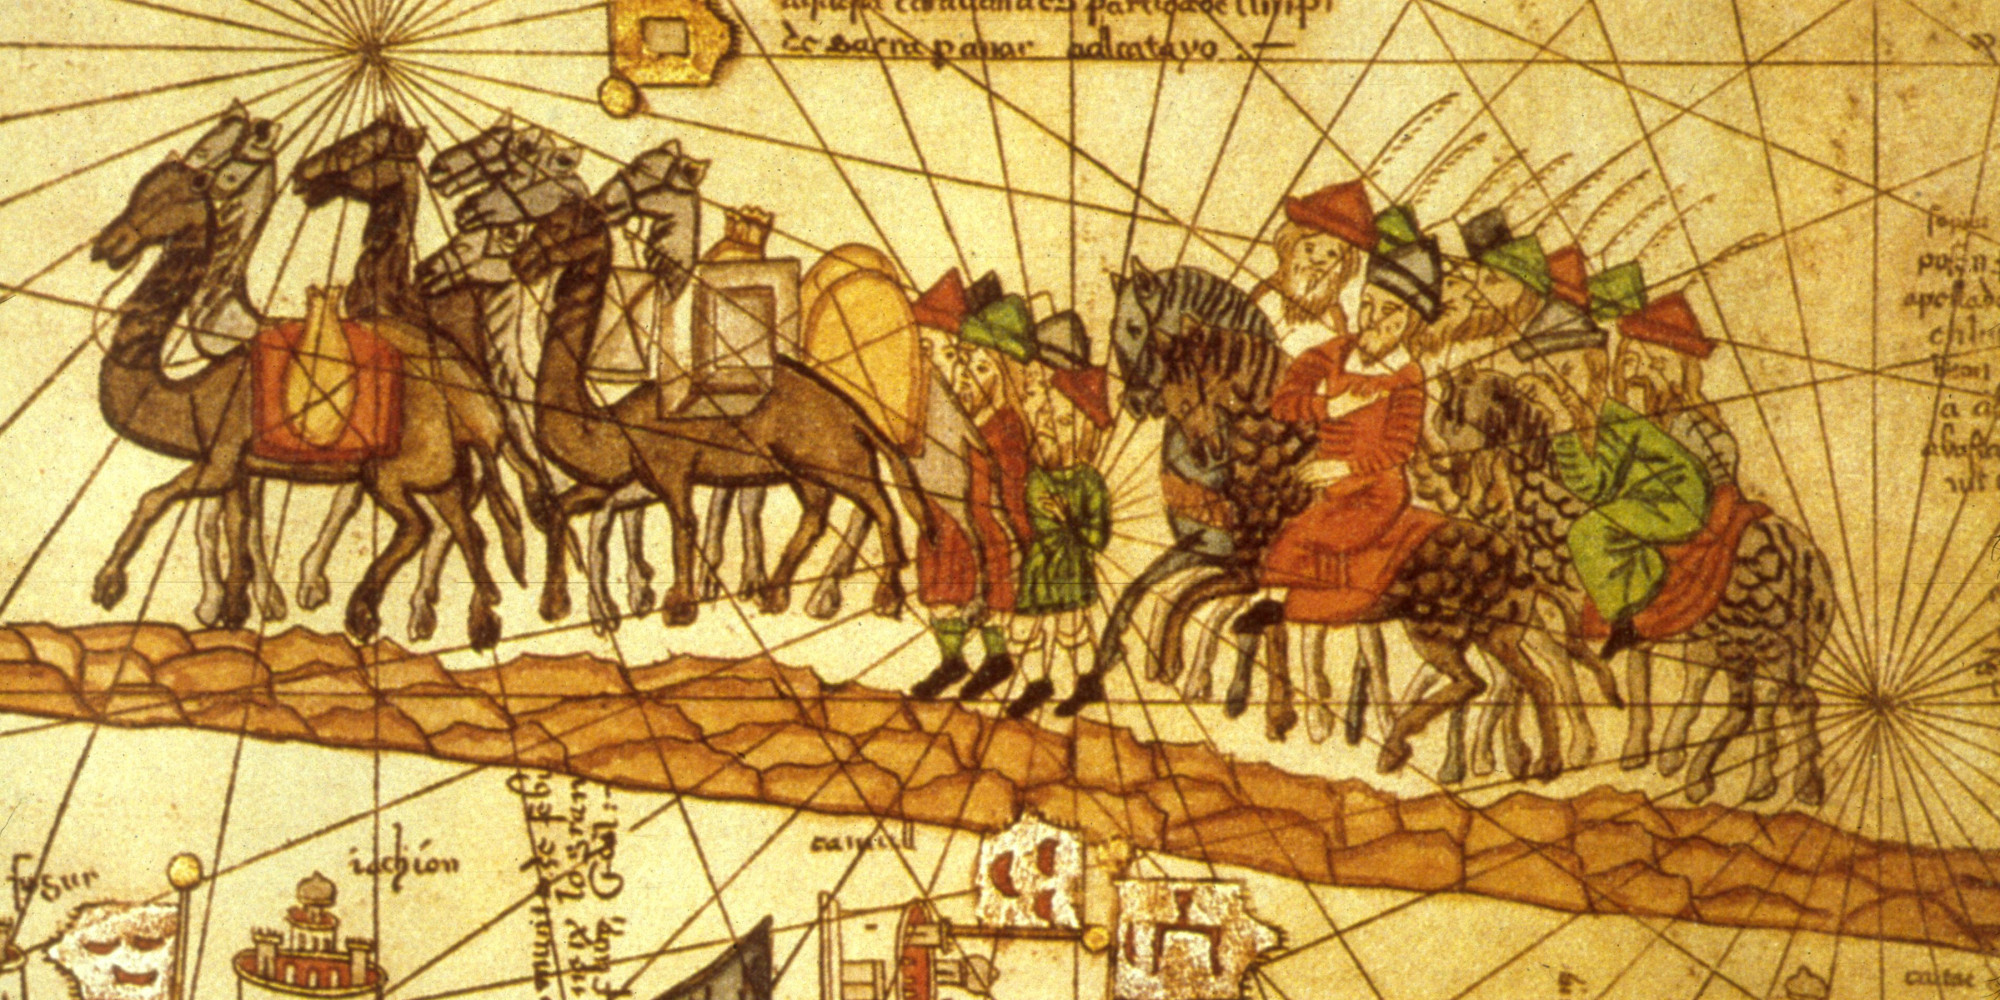 Original Histoire De La Route De La Soie